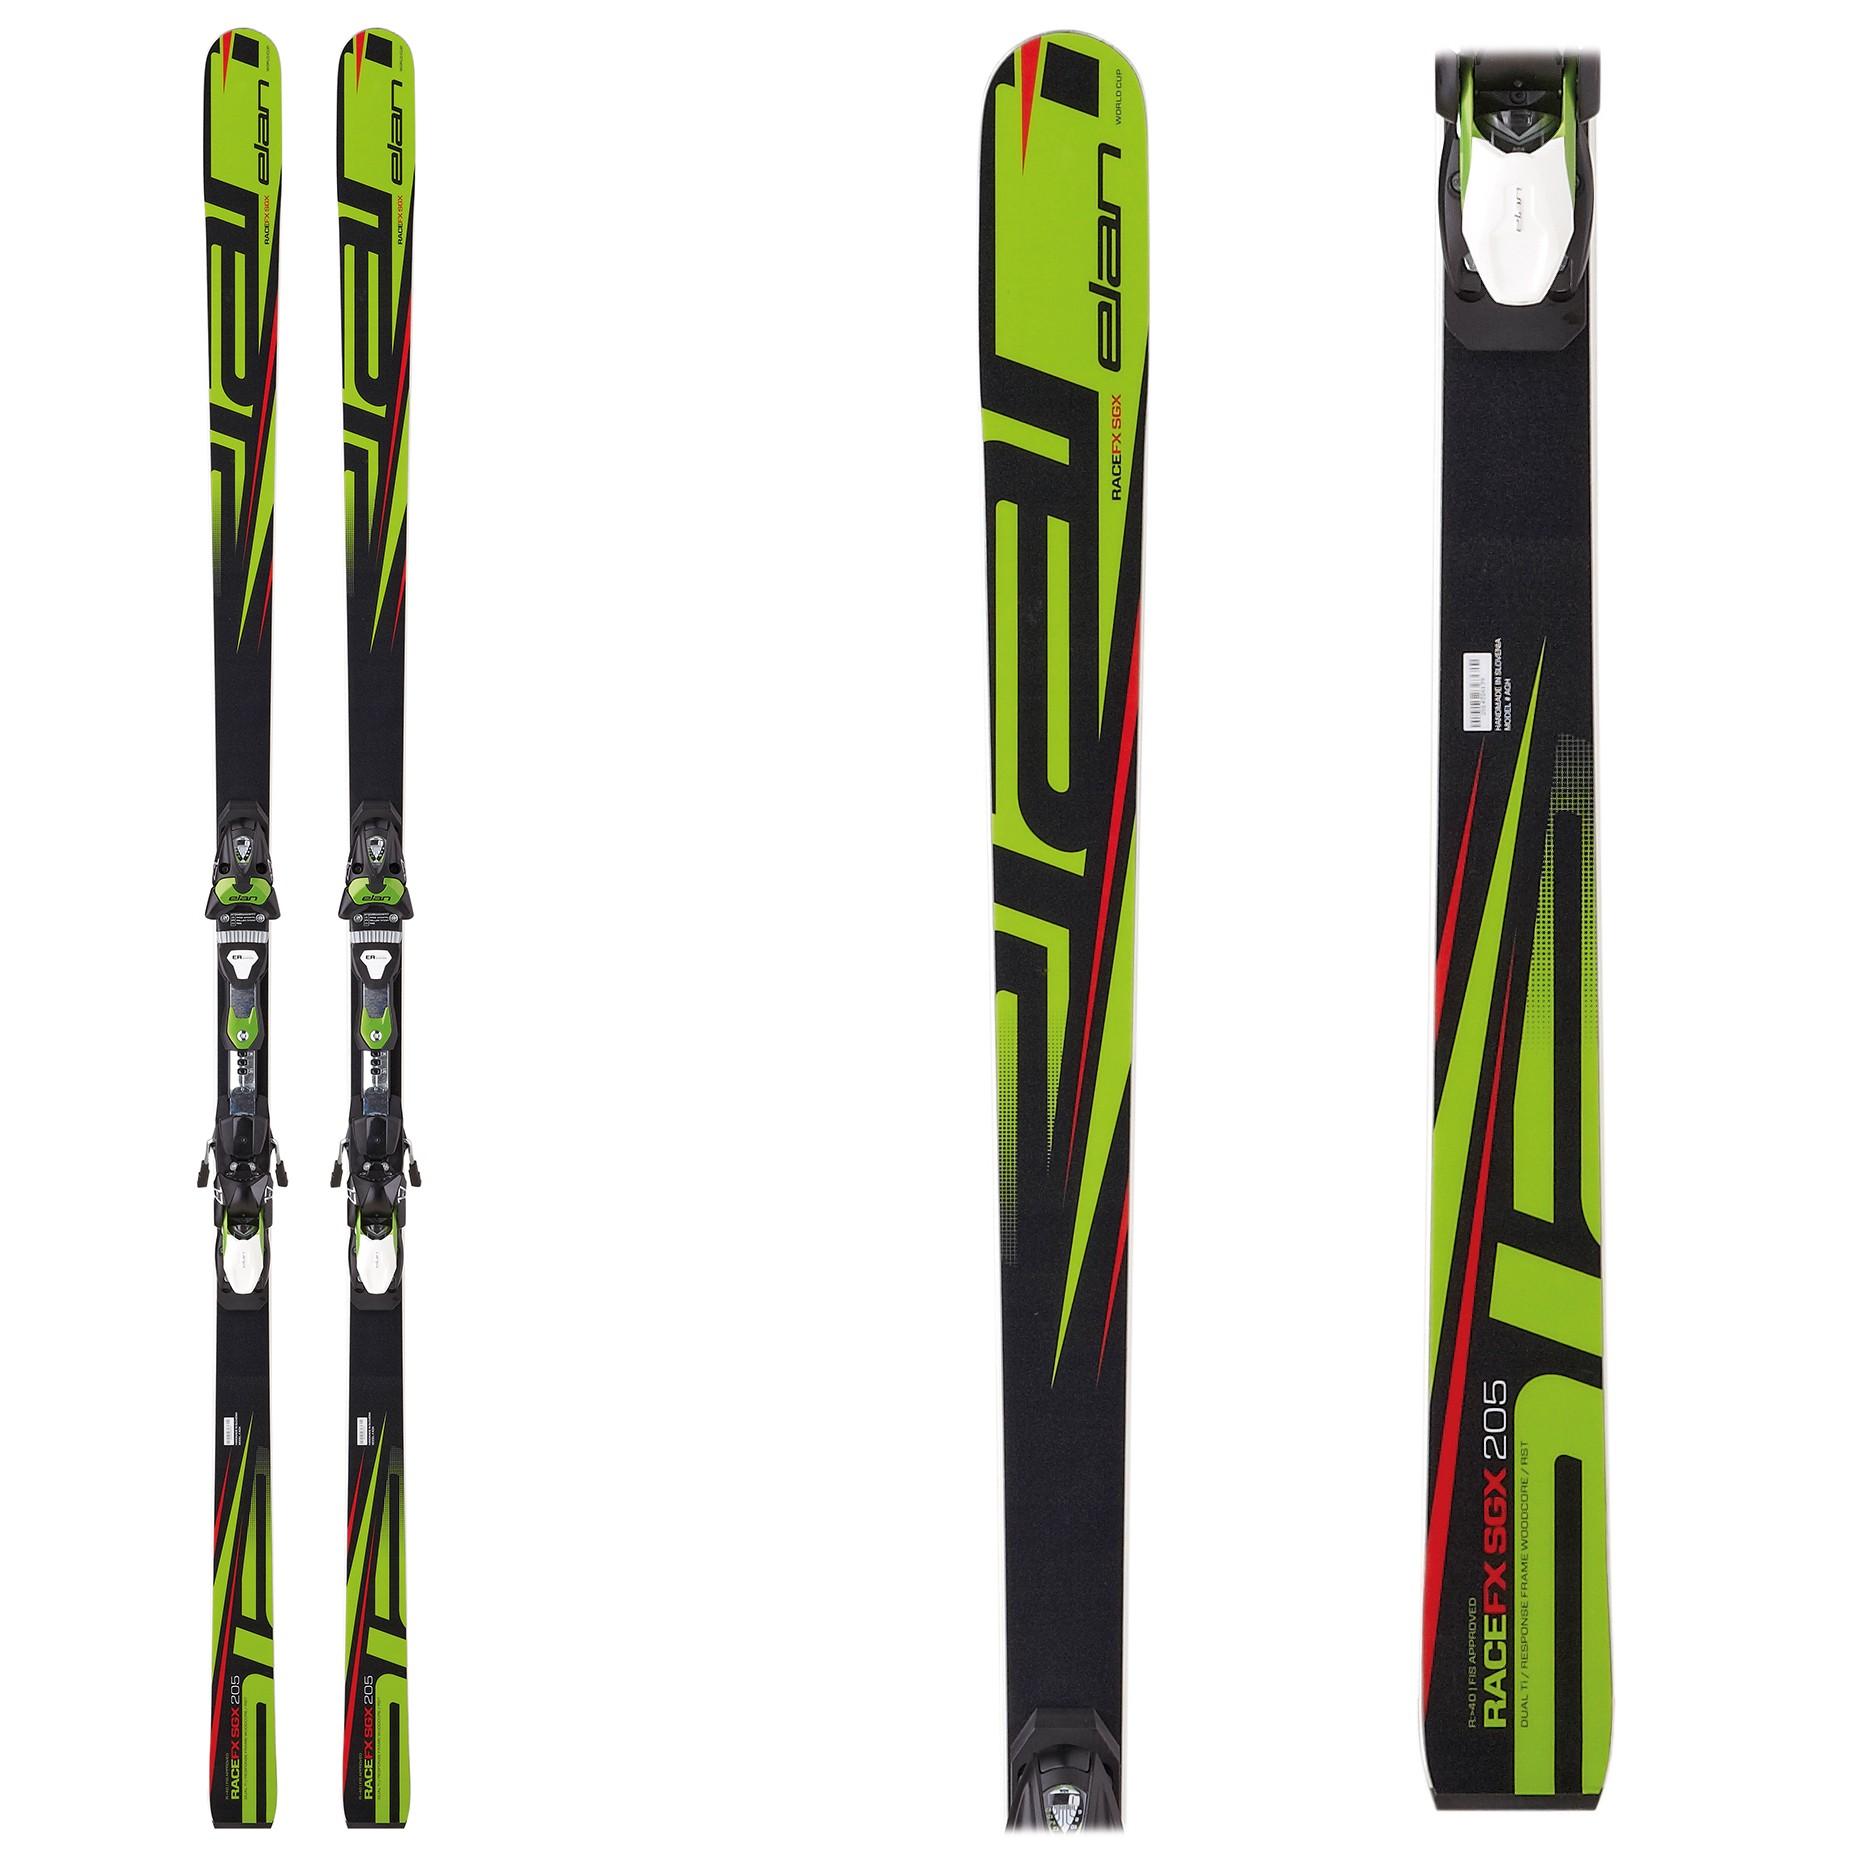 Elan FX SGX Plate, SuperG skis, 2017